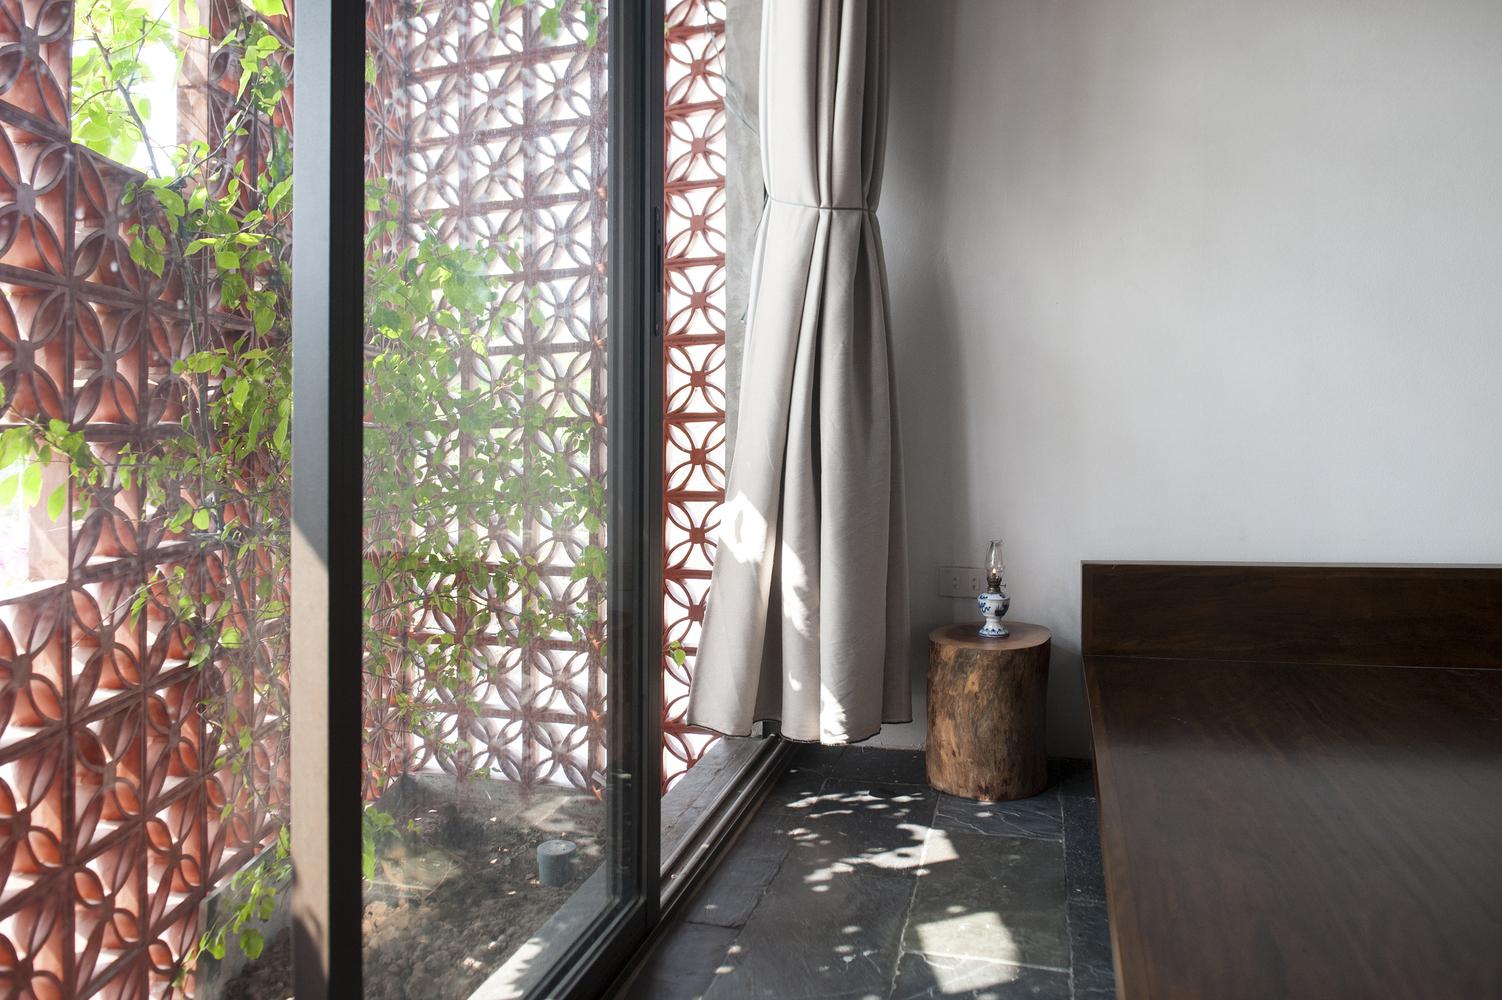 nepi-epiteszet-modern-megoldasokkal-vietnamban-noko-018.jpg